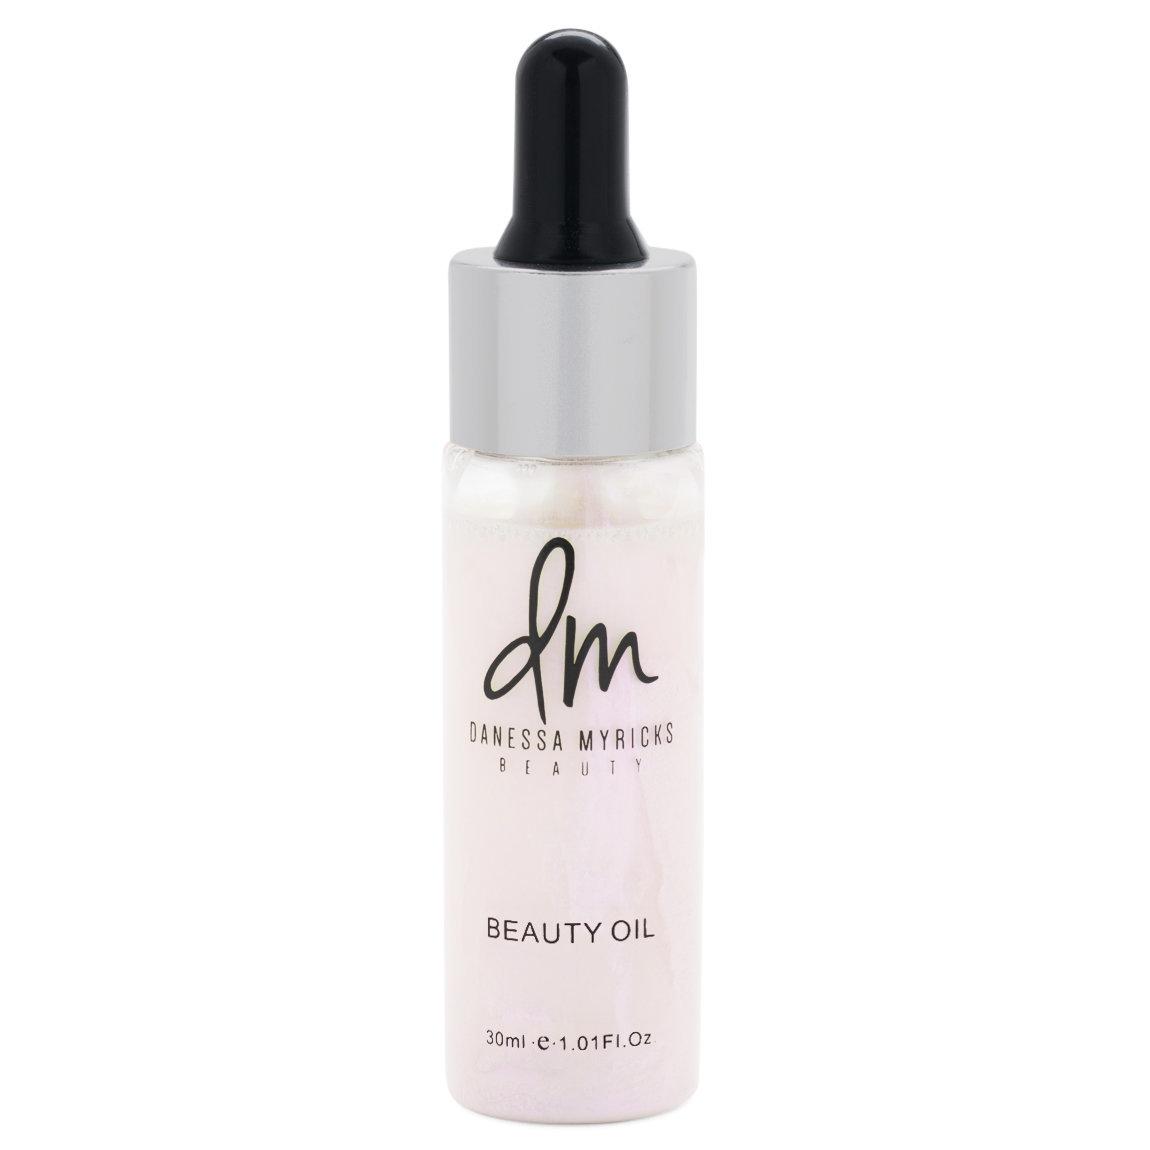 Danessa Myricks Beauty Love & Light Beauty Oil Eternal Flame product swatch.